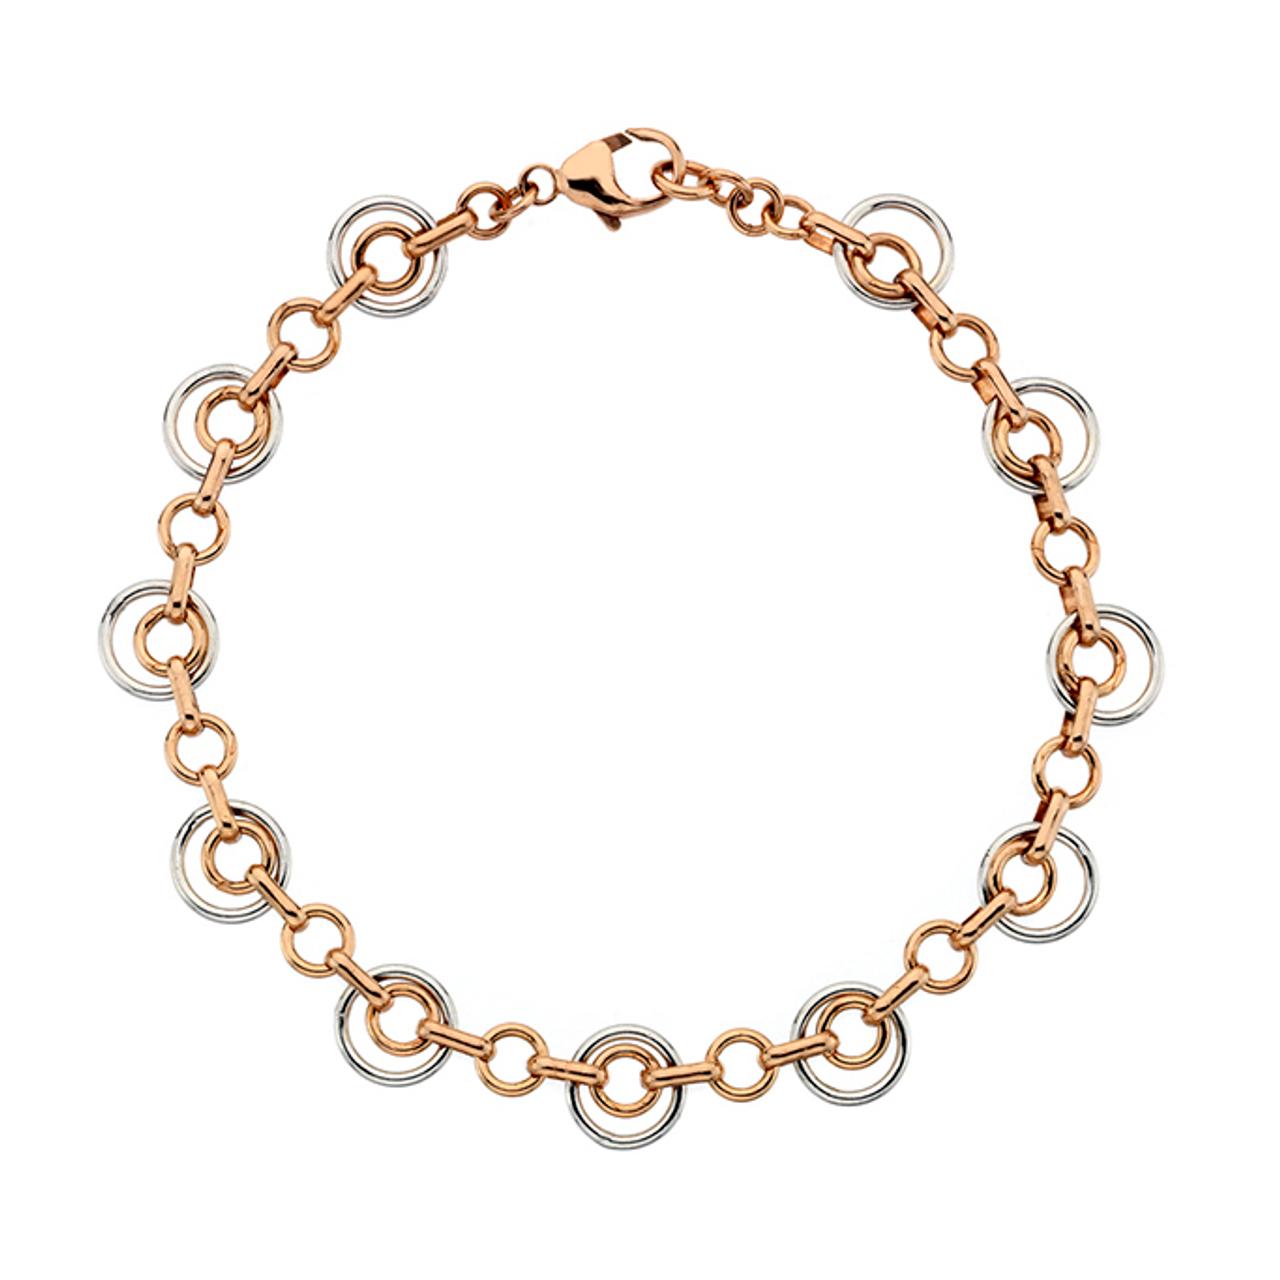 9ct Rose & White Gold double circle Bracelet